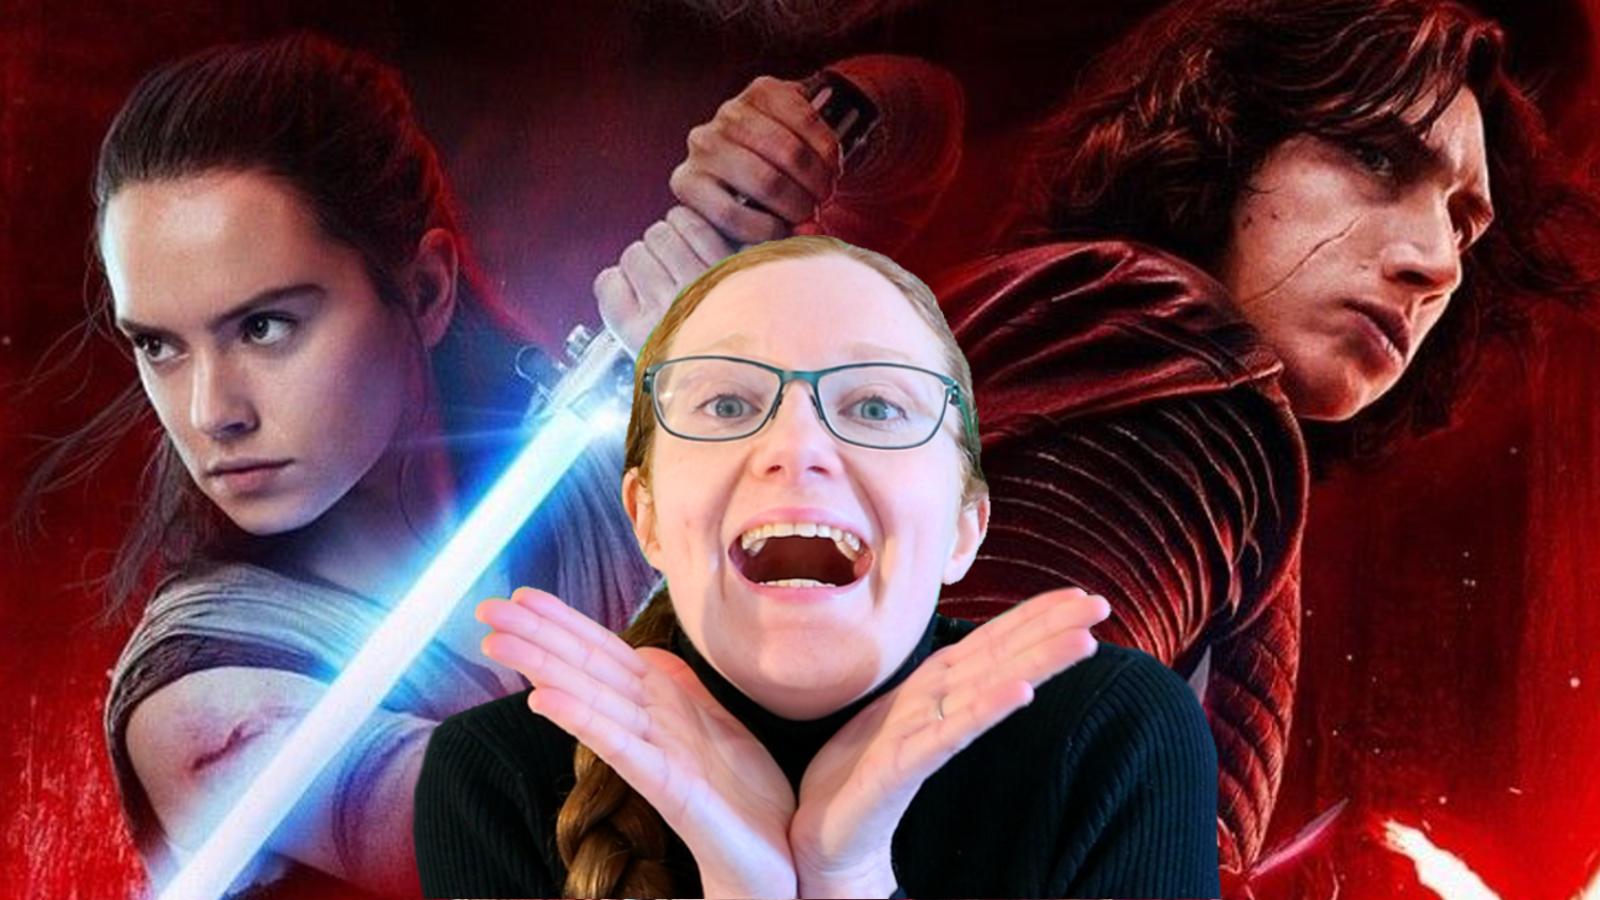 The Last Jedi fight analysis